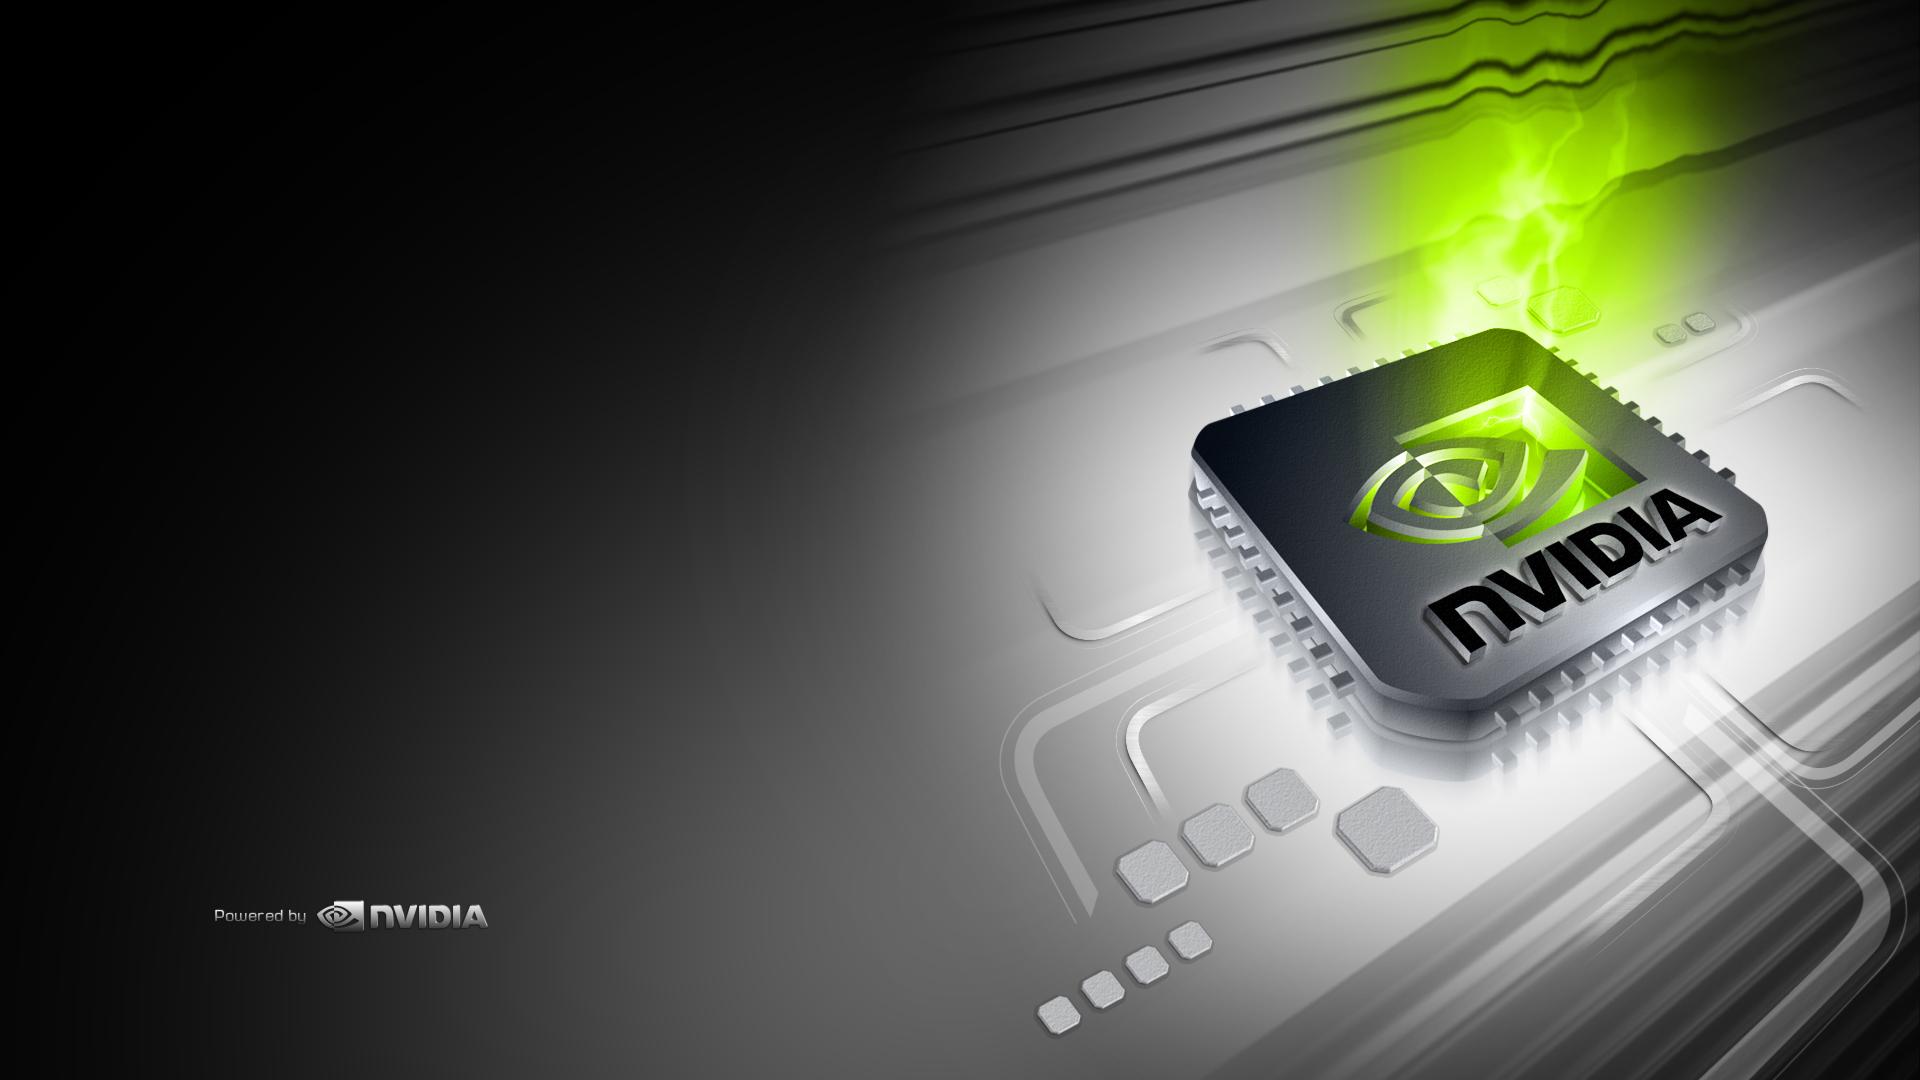 Download Nvidia HD Wallpaper 1739 Full Size downloadwallpaperhd 1920x1080